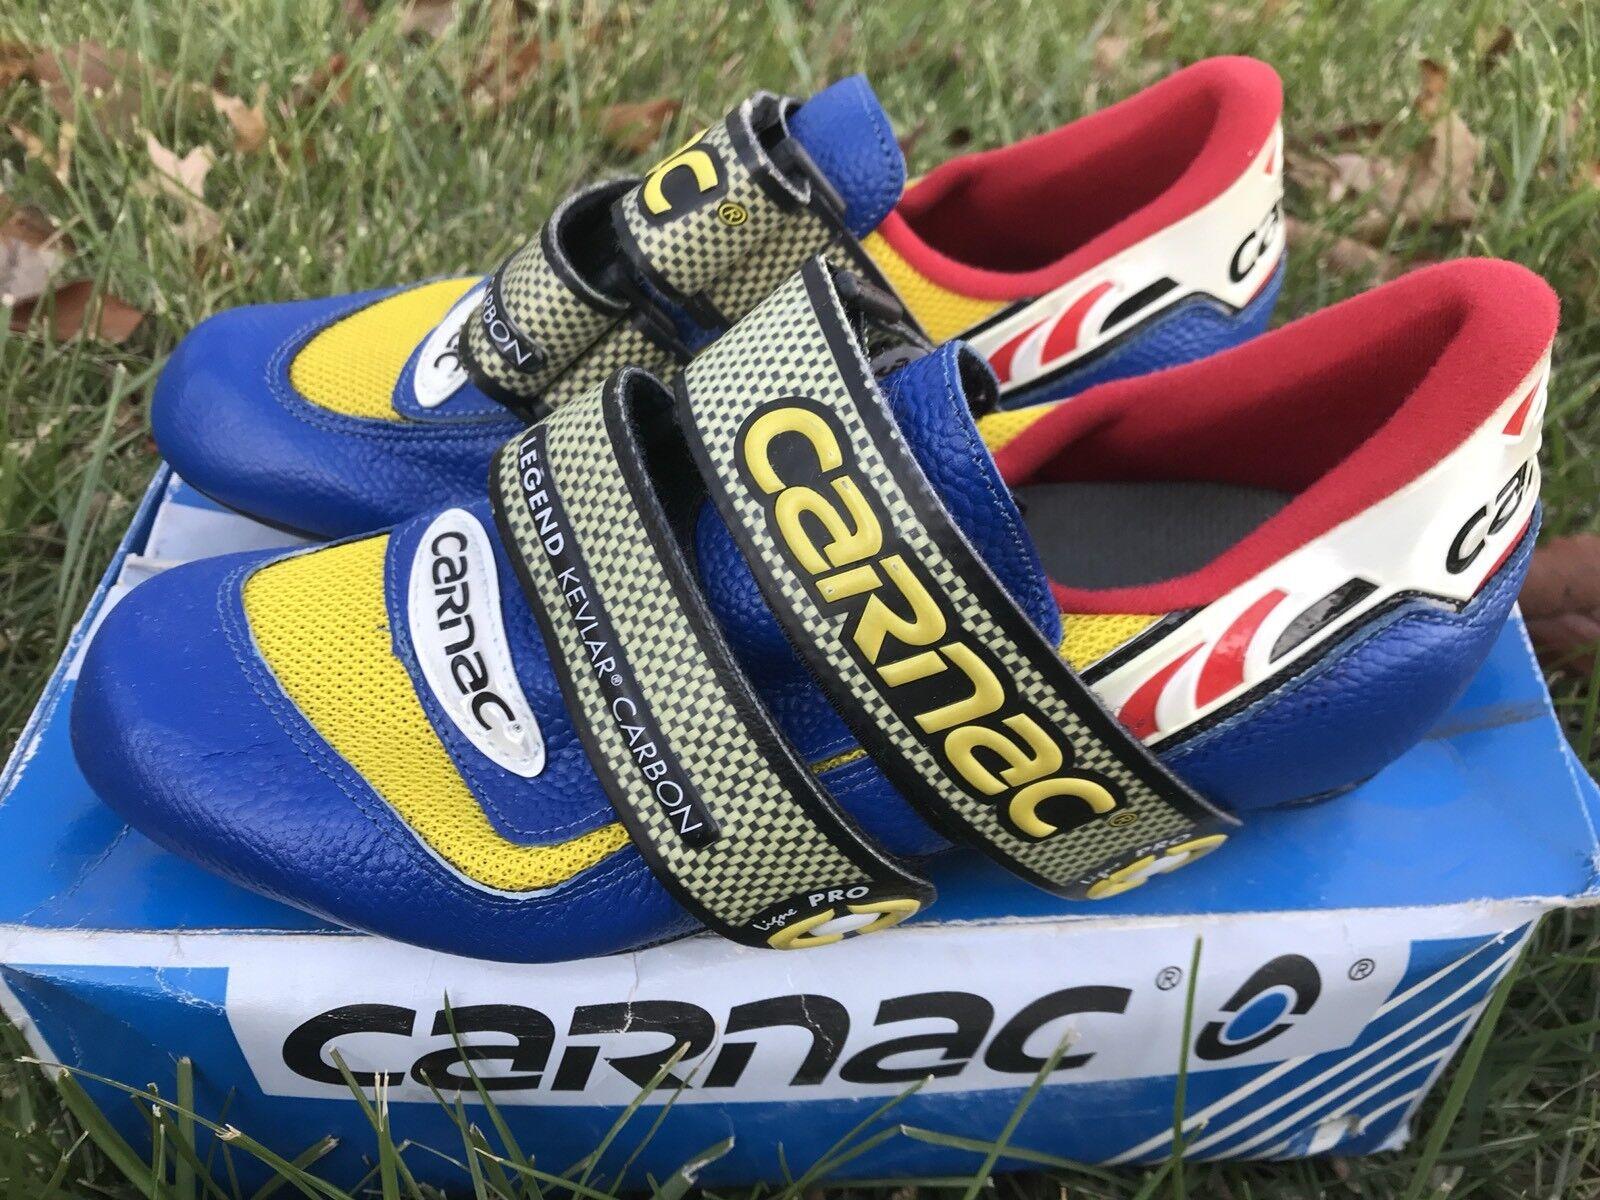 Carnac Cycling shoes Legend  Carbon Pro SIZE 39 NIB Free Ship to USA